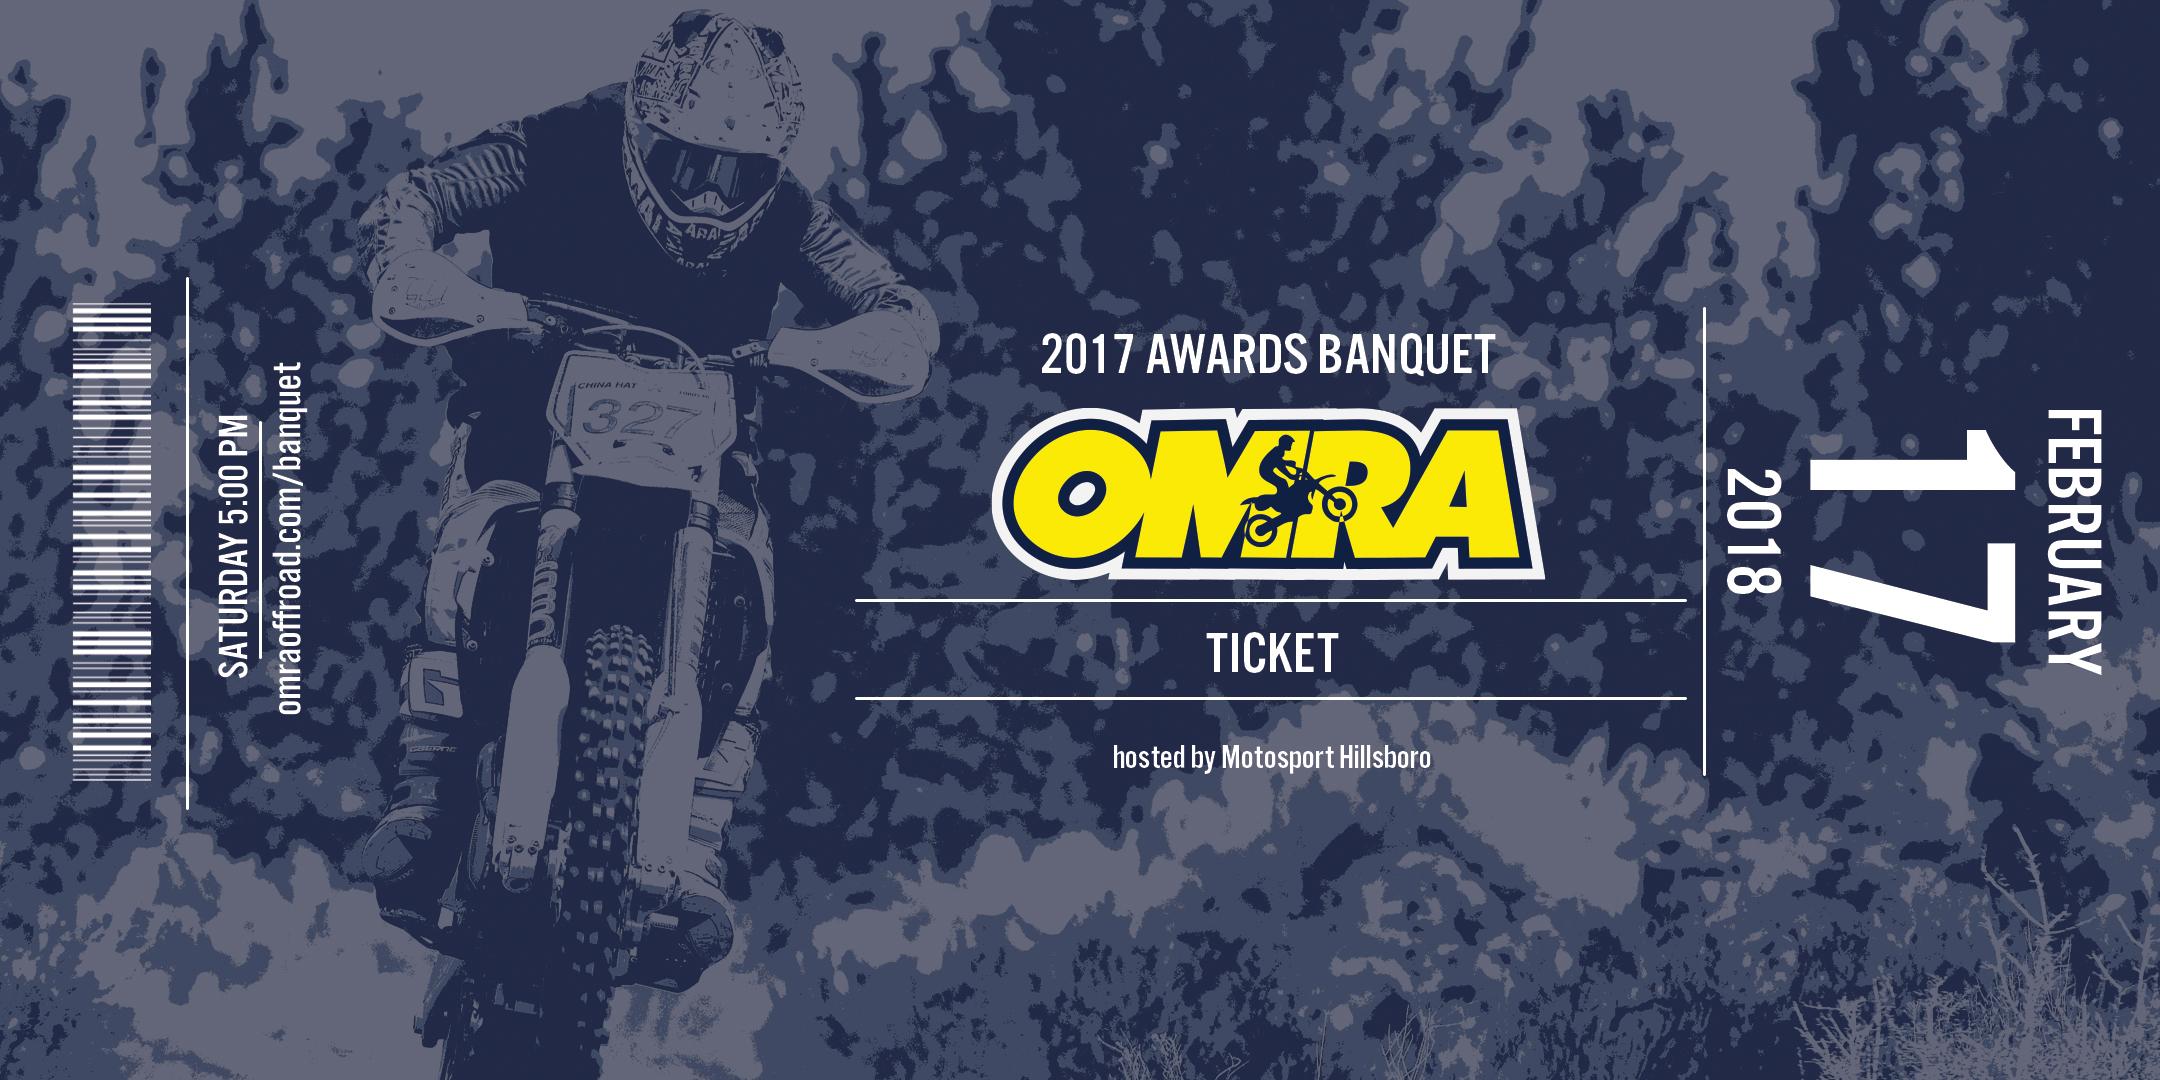 2017_OMRA_Awards_Banquet_Ticket_Web.jpg